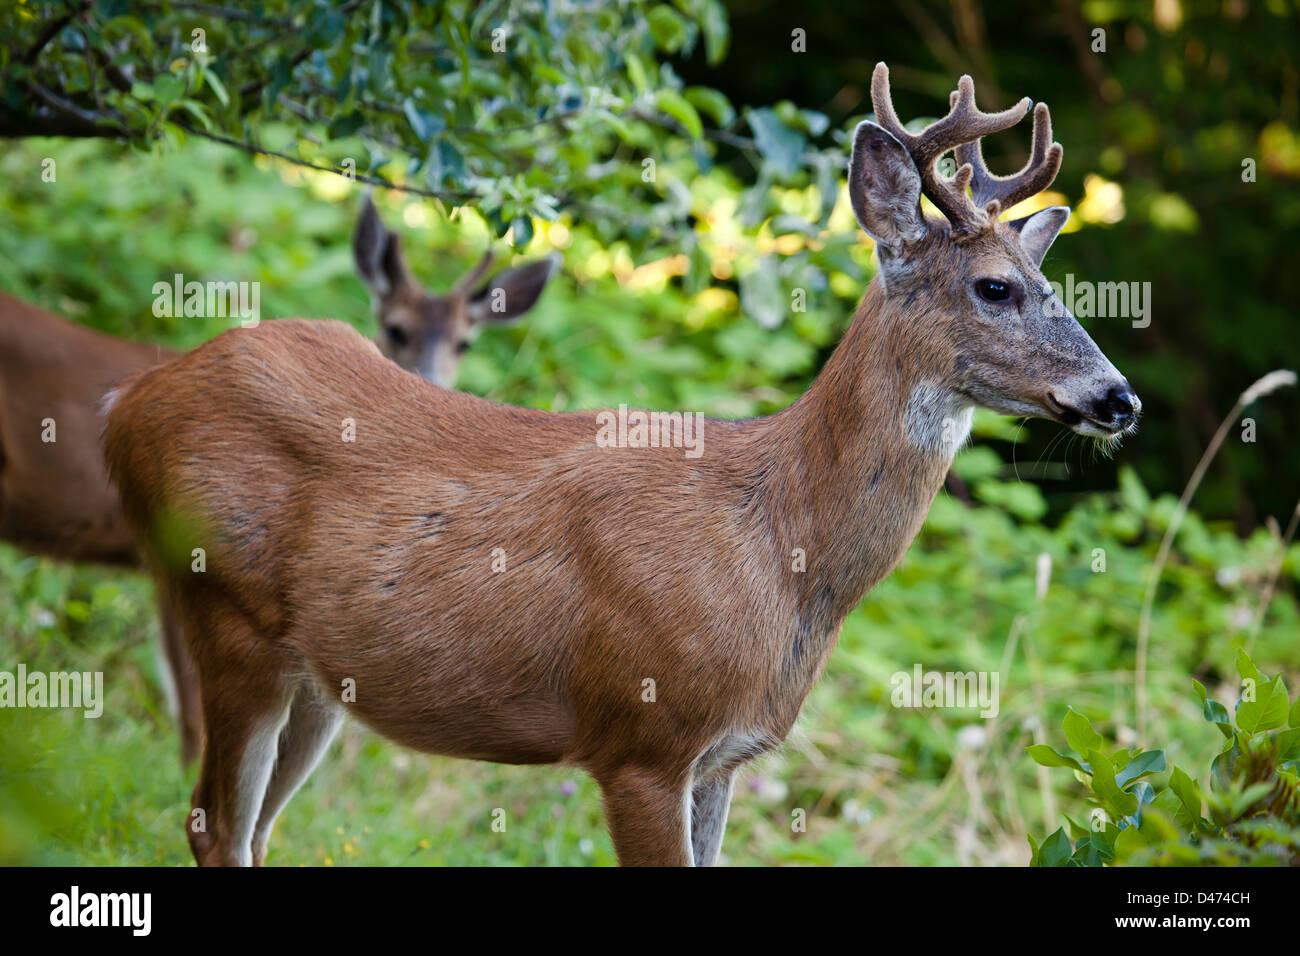 The mule deer or black-tailed deer, Odocoileus hemionus, British Columbia, Canada. - Stock Image